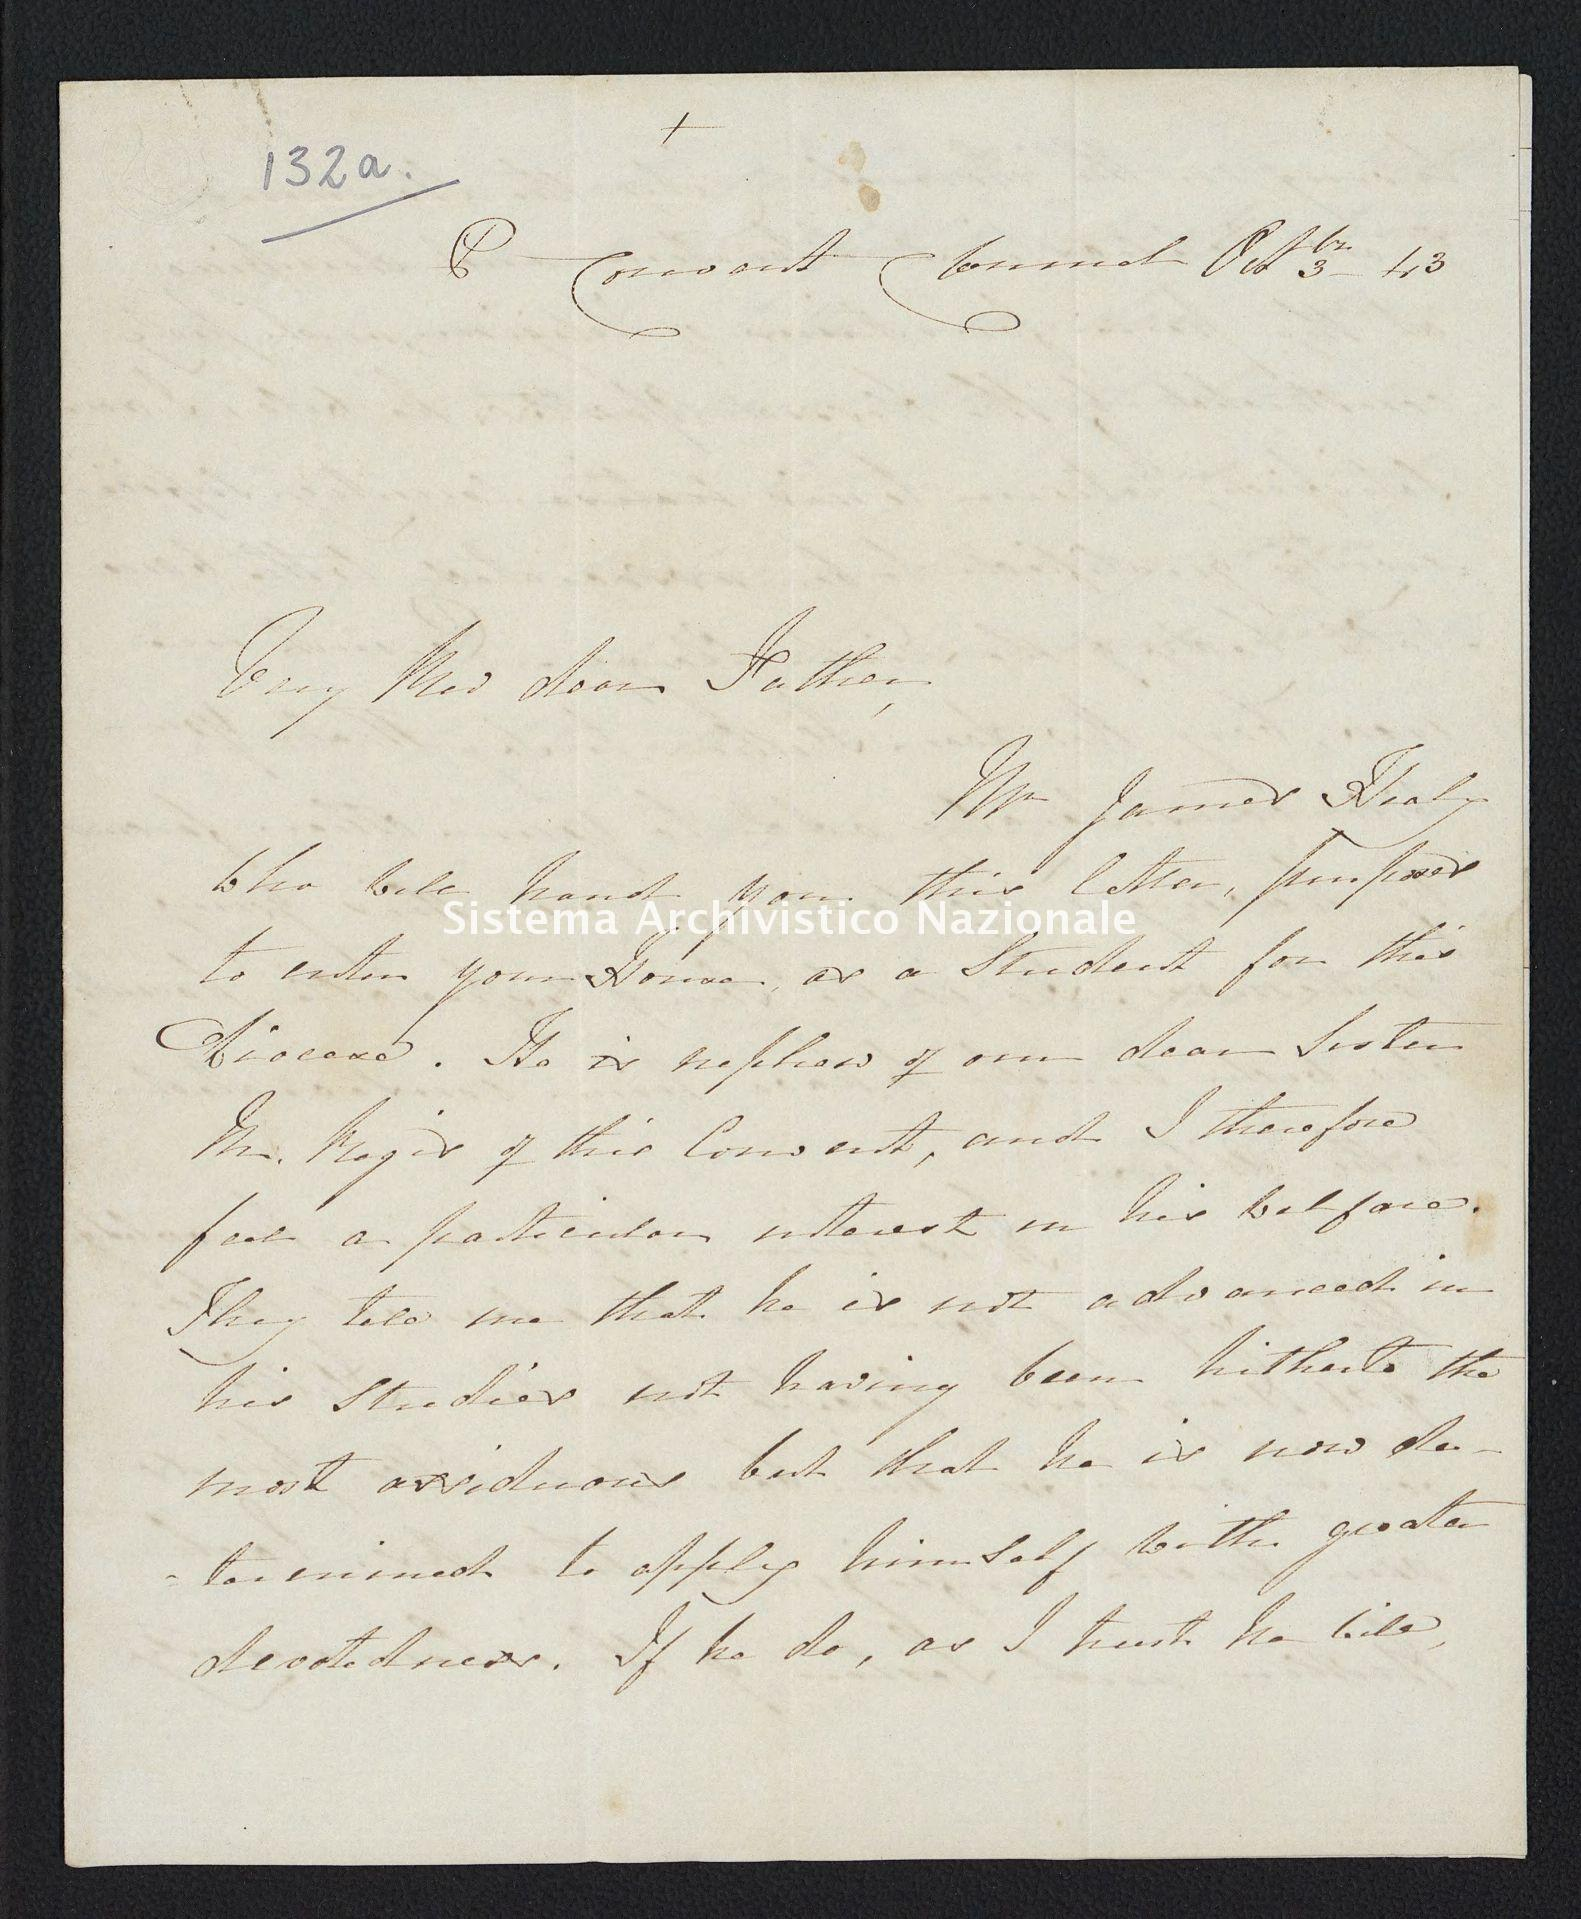 Pontificio Collegio Irlandese - Kirby_1842_132_a